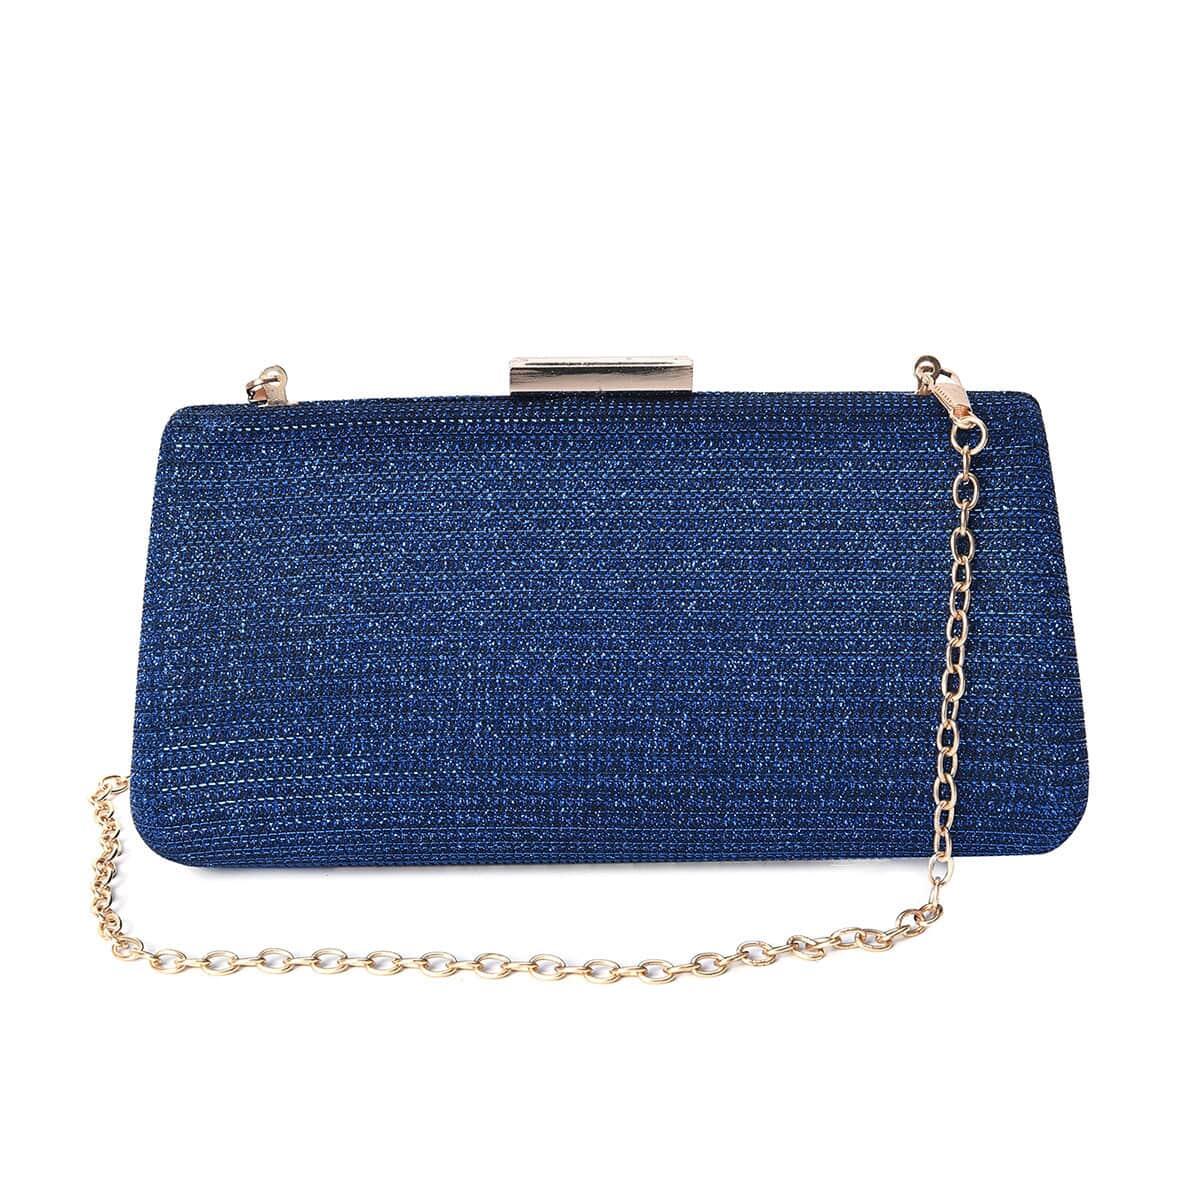 Minimalist Glossy Metallic Clutch Chain Bag Evening Bags Carry Purse Cross Body